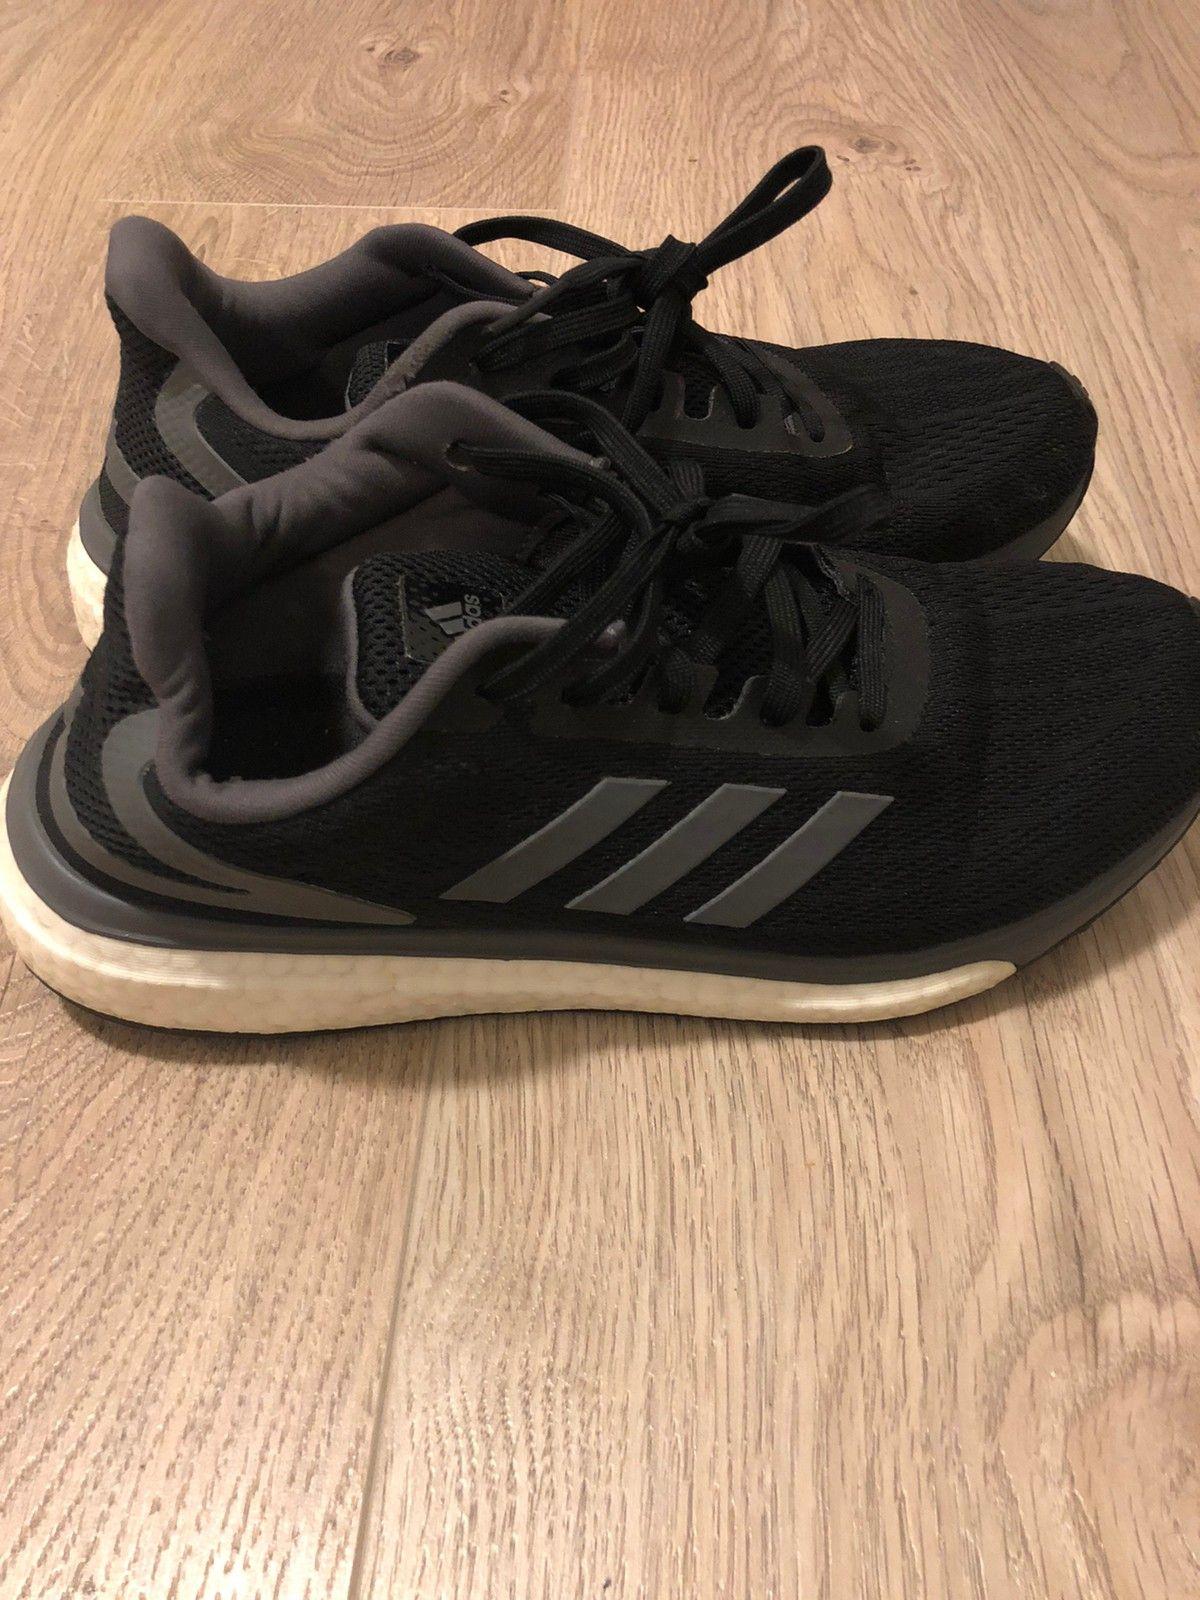 Adidas joggesko str 39 13 | FINN.no